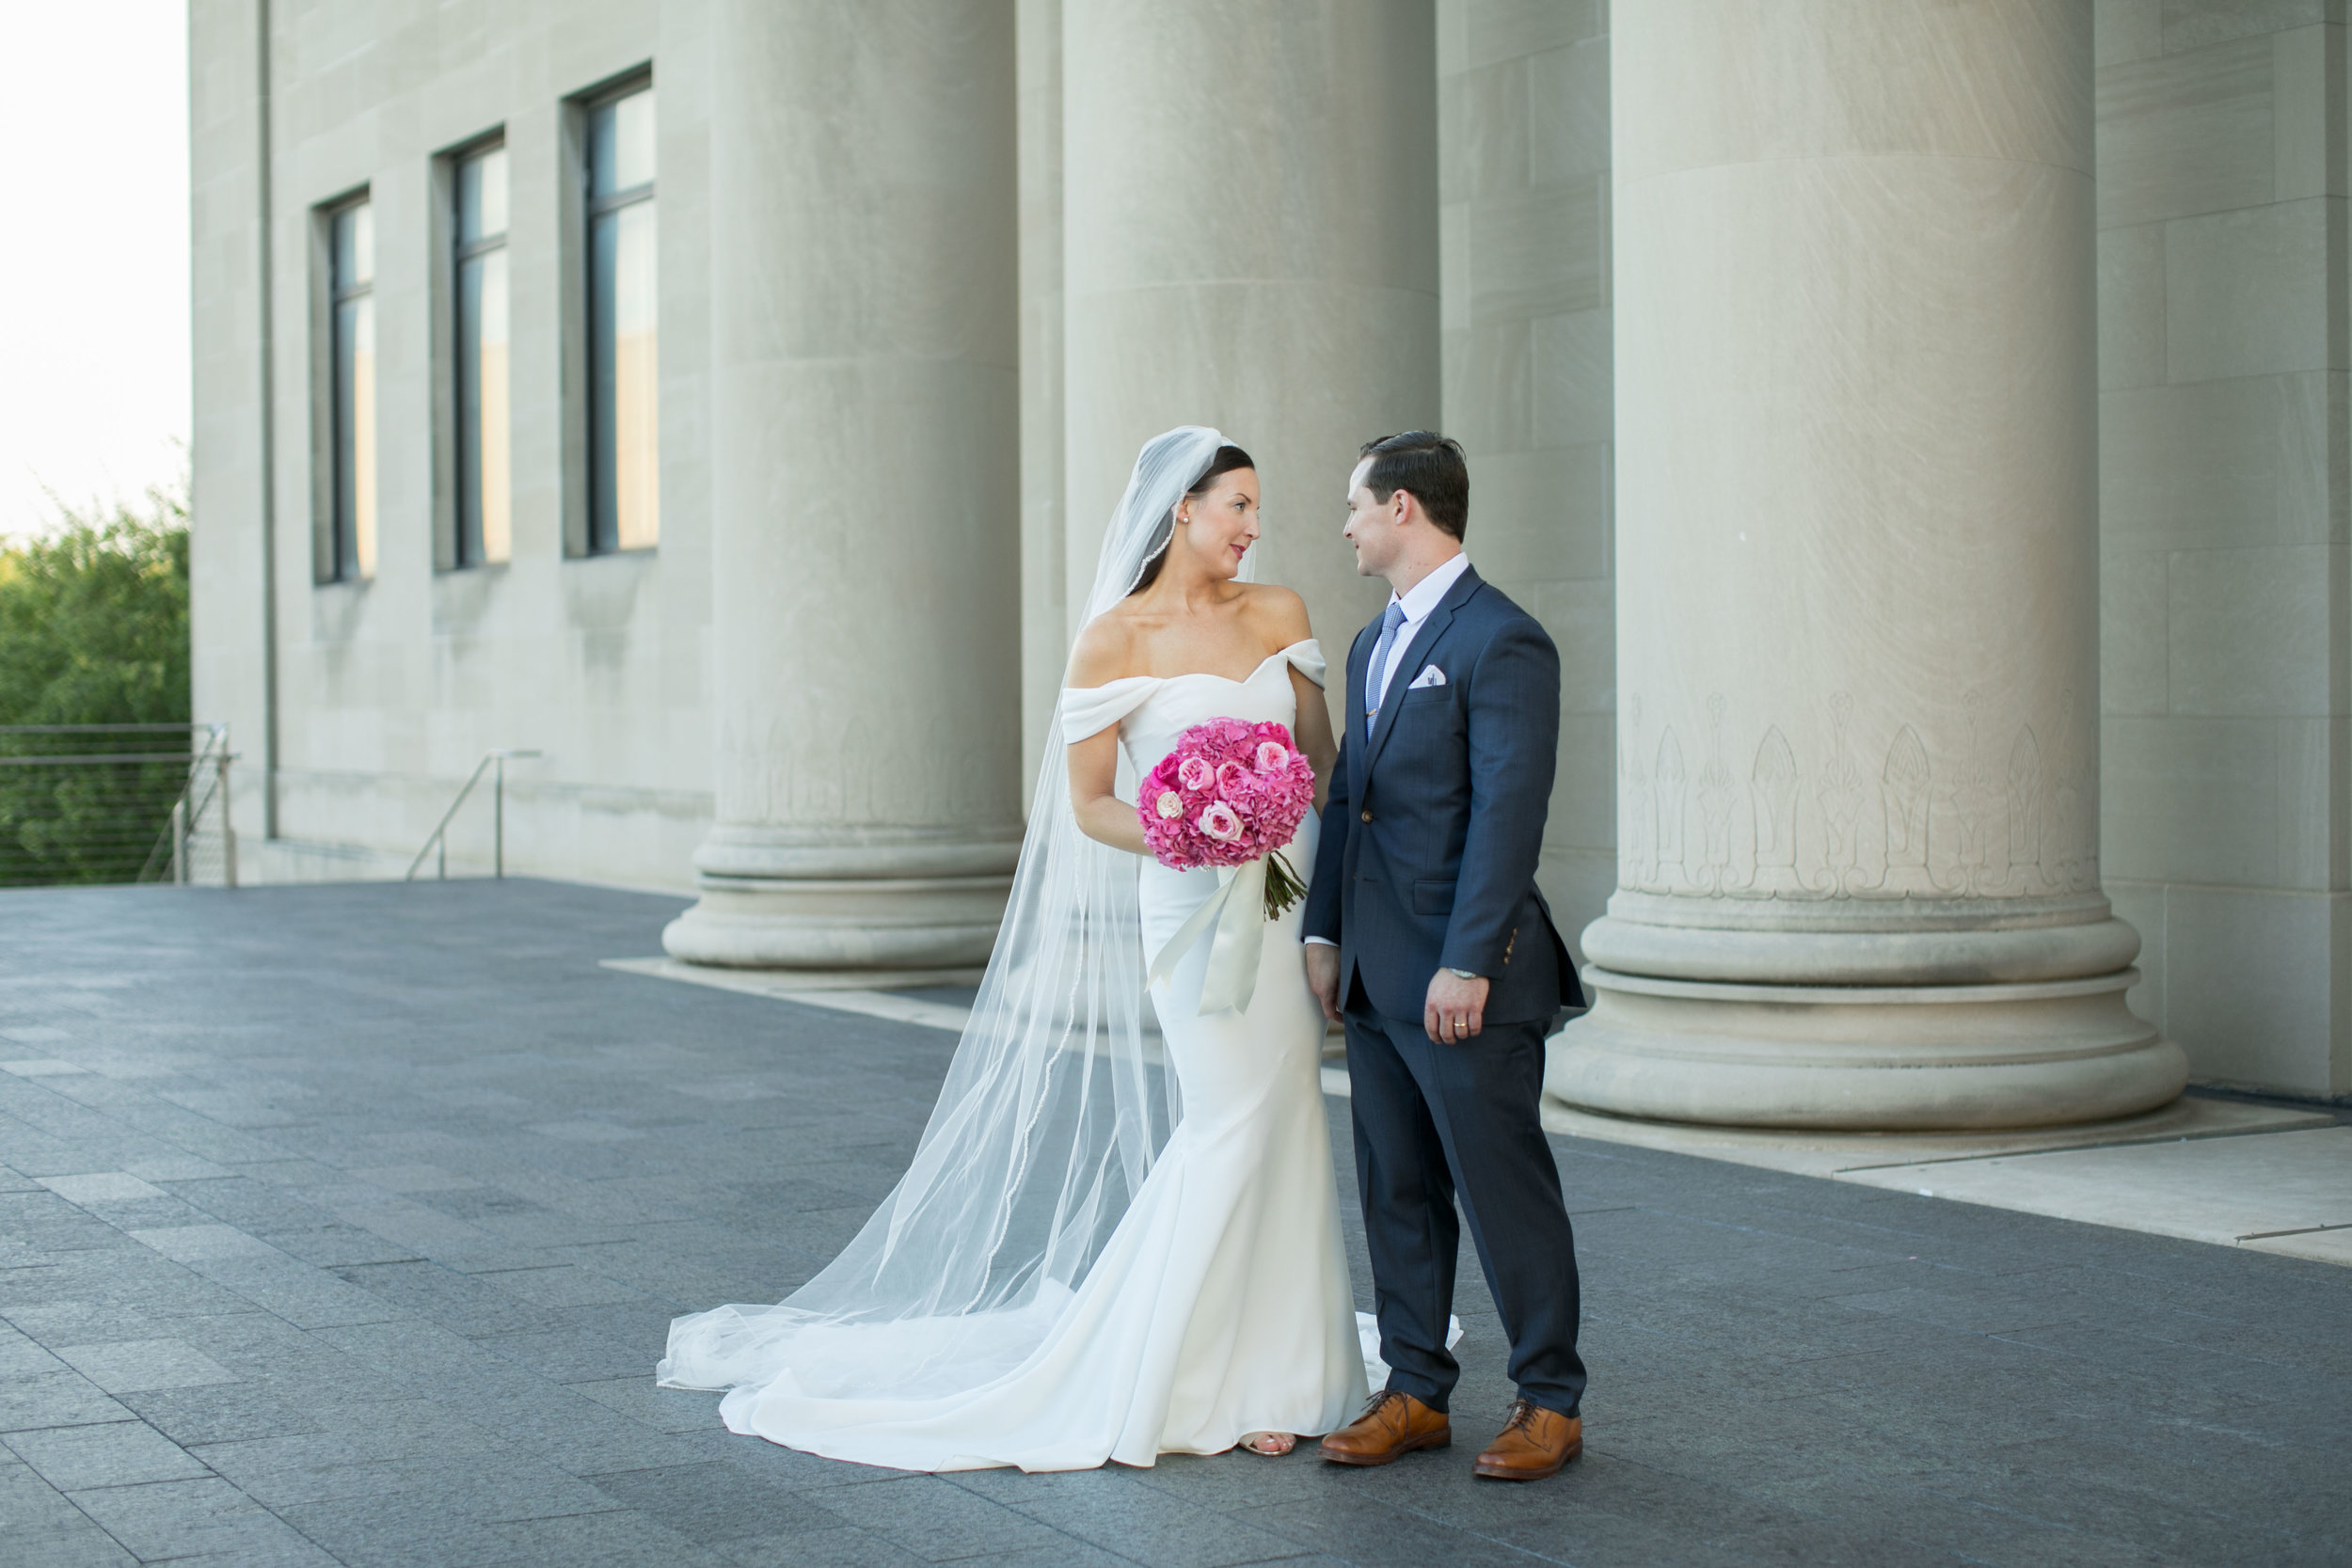 nelson-atkins-wedding-57.jpg